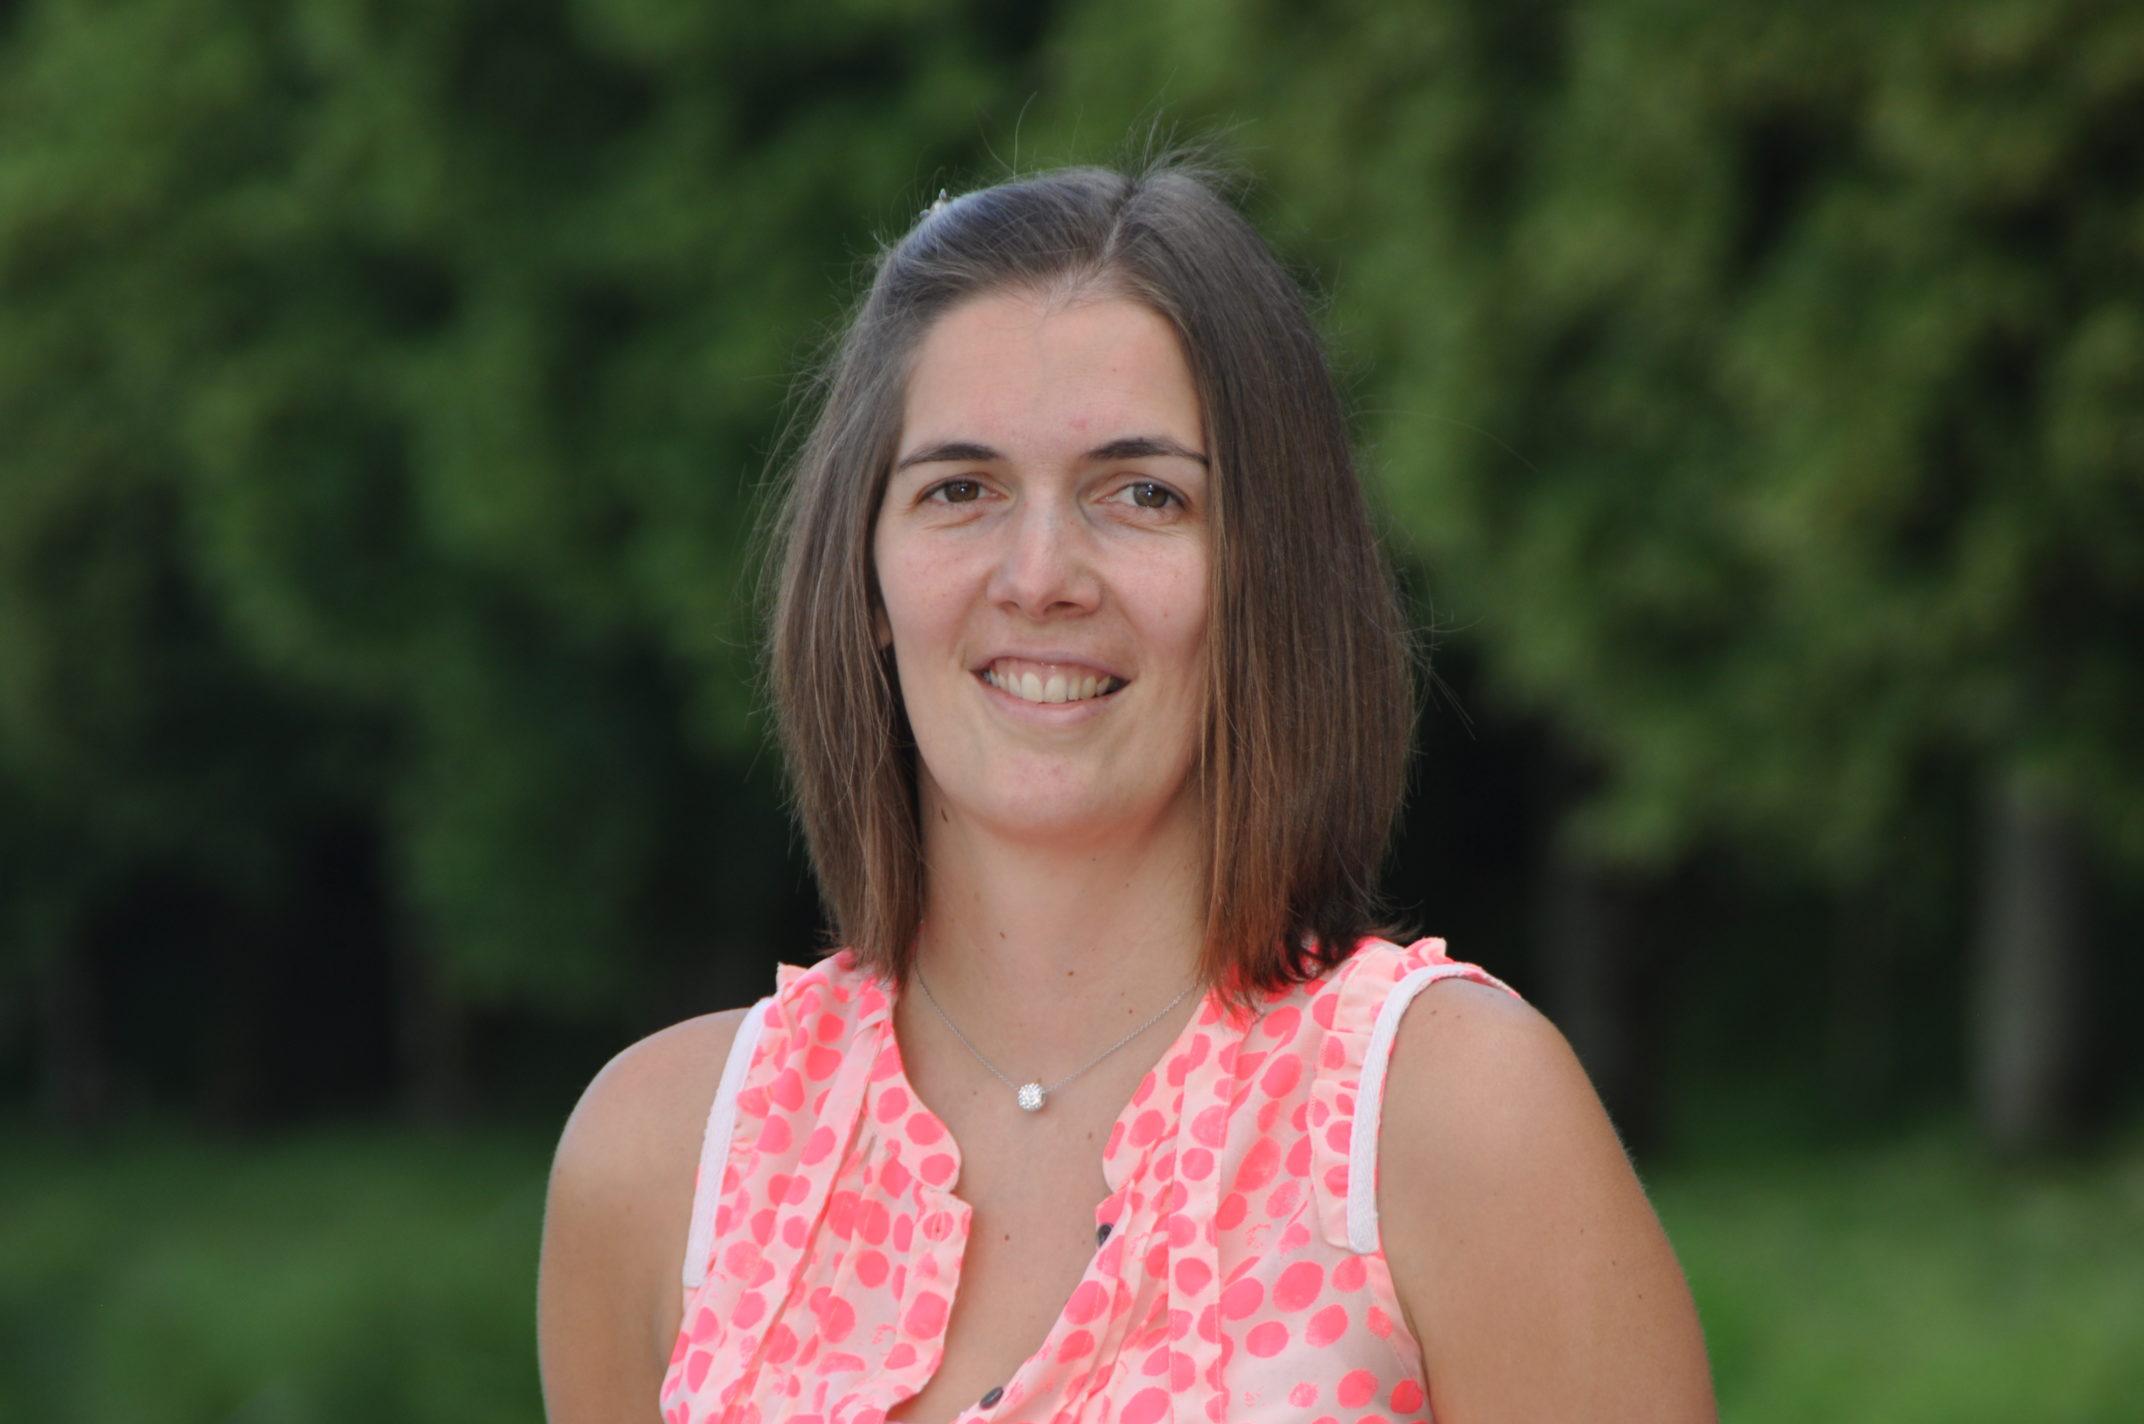 Lucie Poncelet